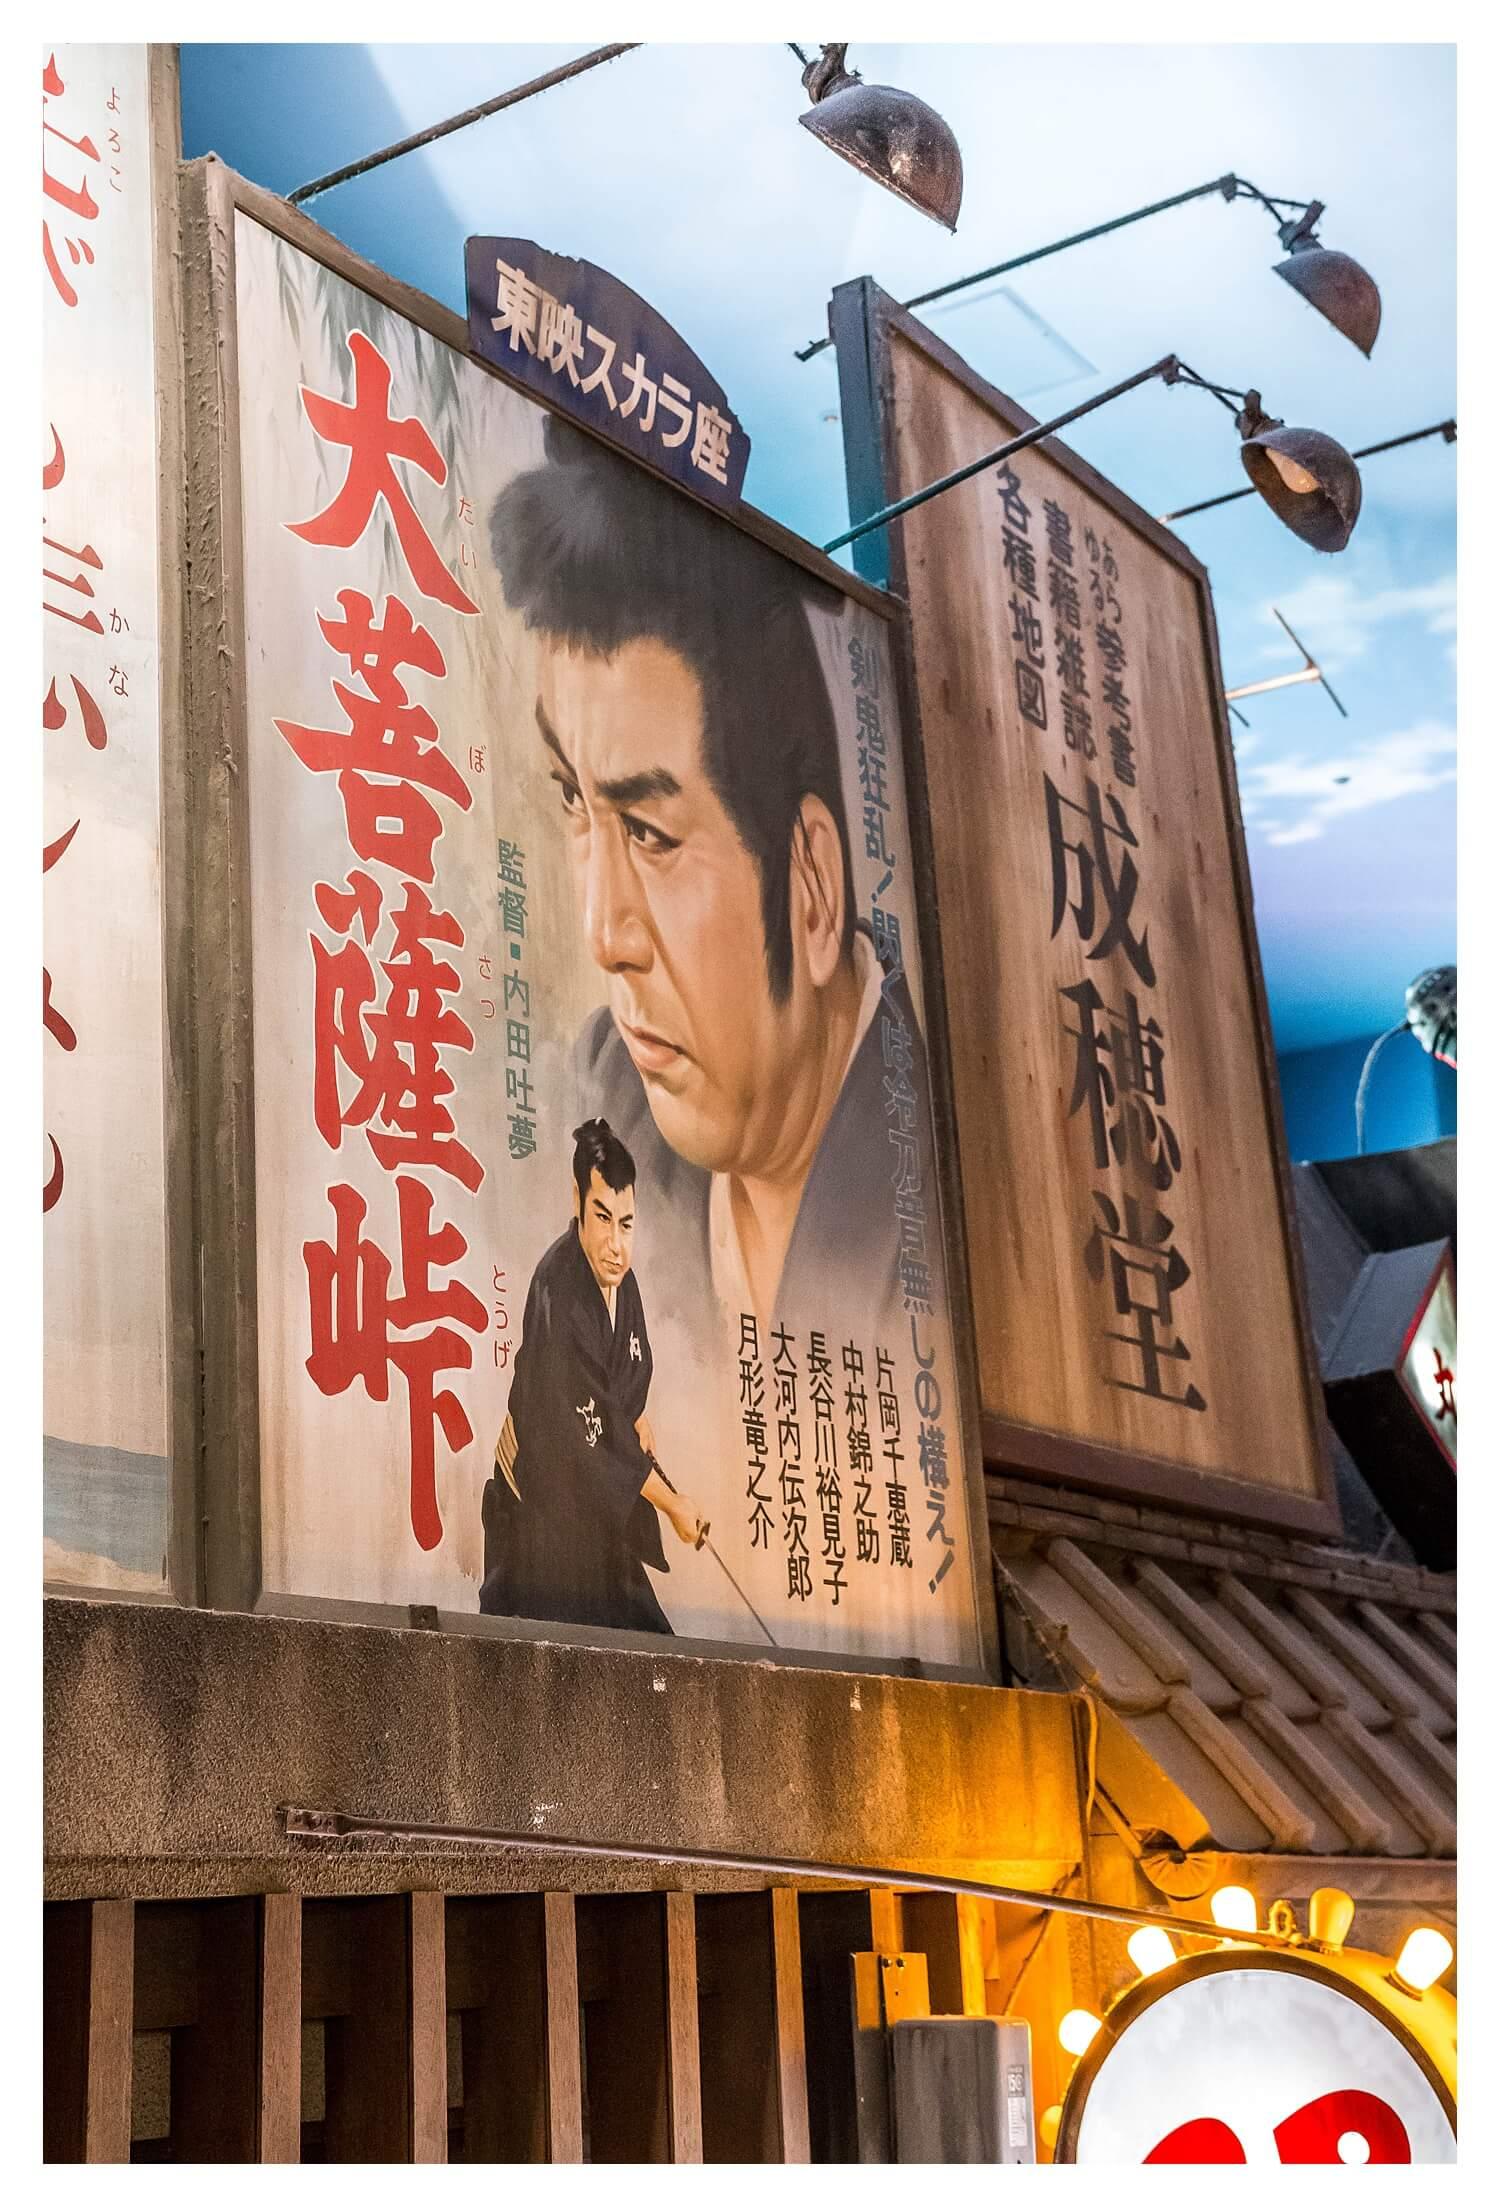 Things To Do In Tokyo, Japan - Ramen museum